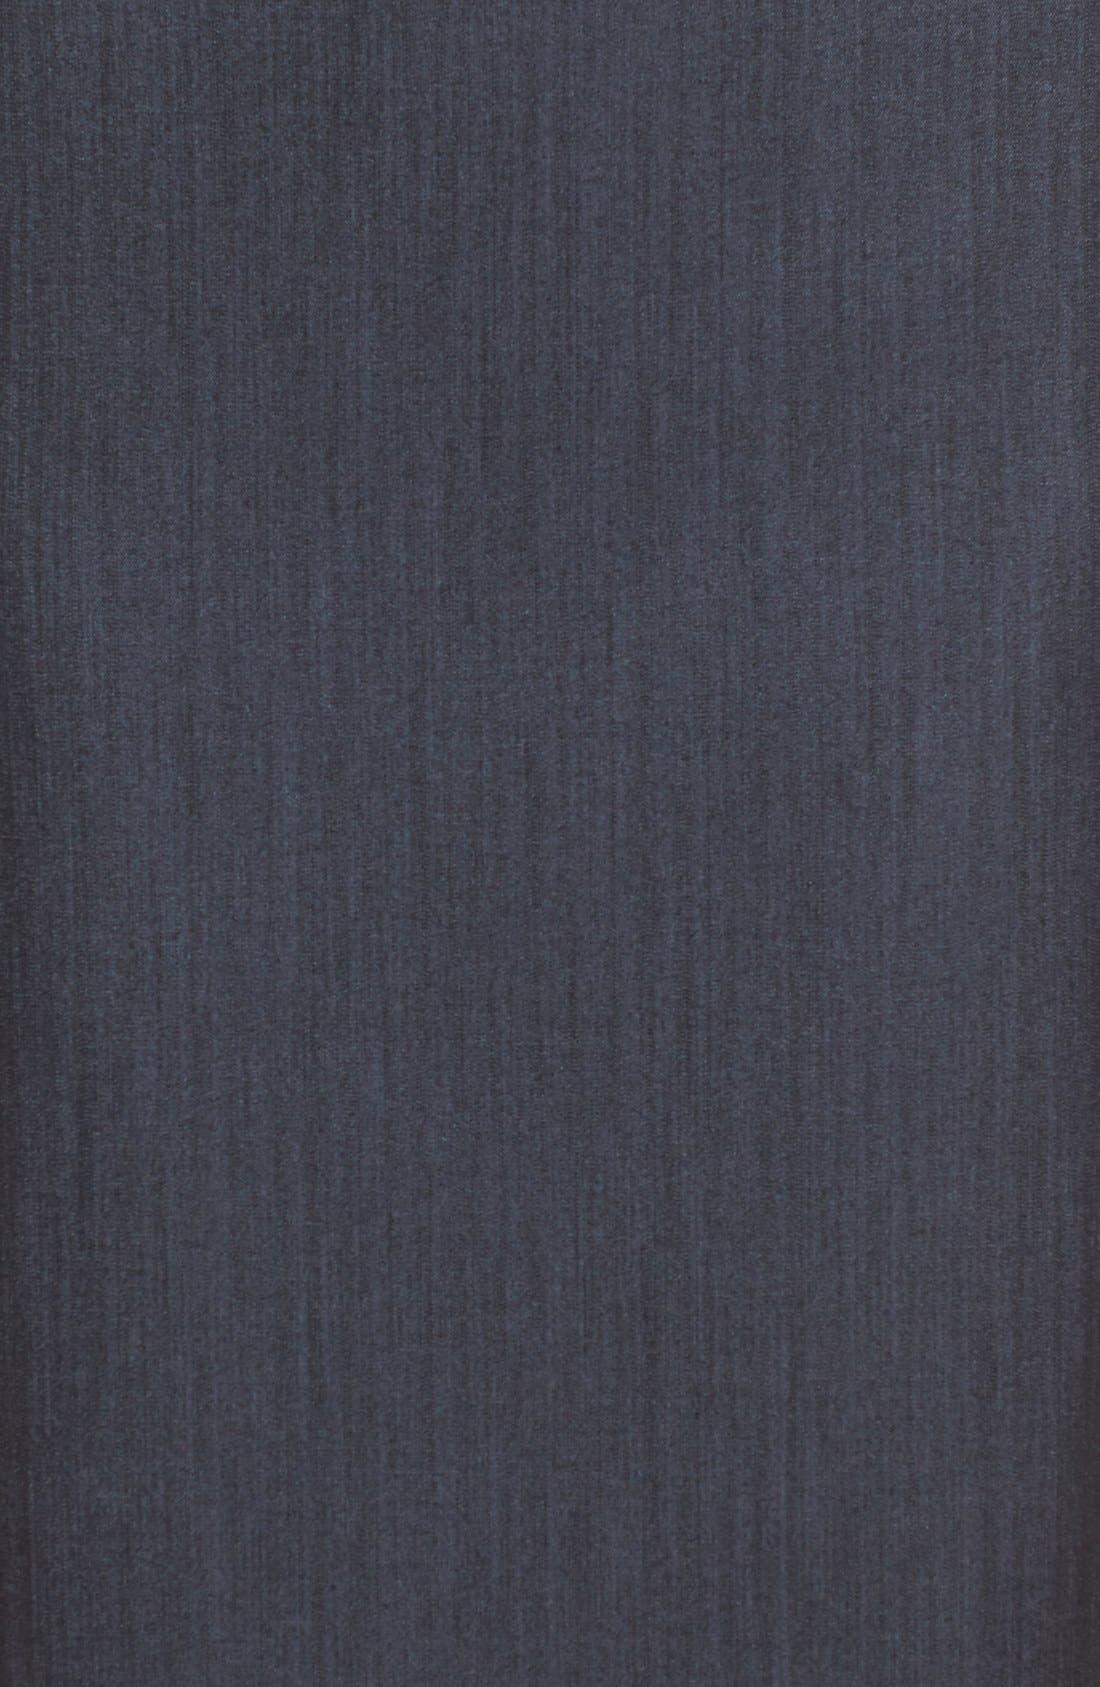 ANNE KLEIN, Stretch Woven Suit Skirt, Alternate thumbnail 6, color, INDIGO TWILL